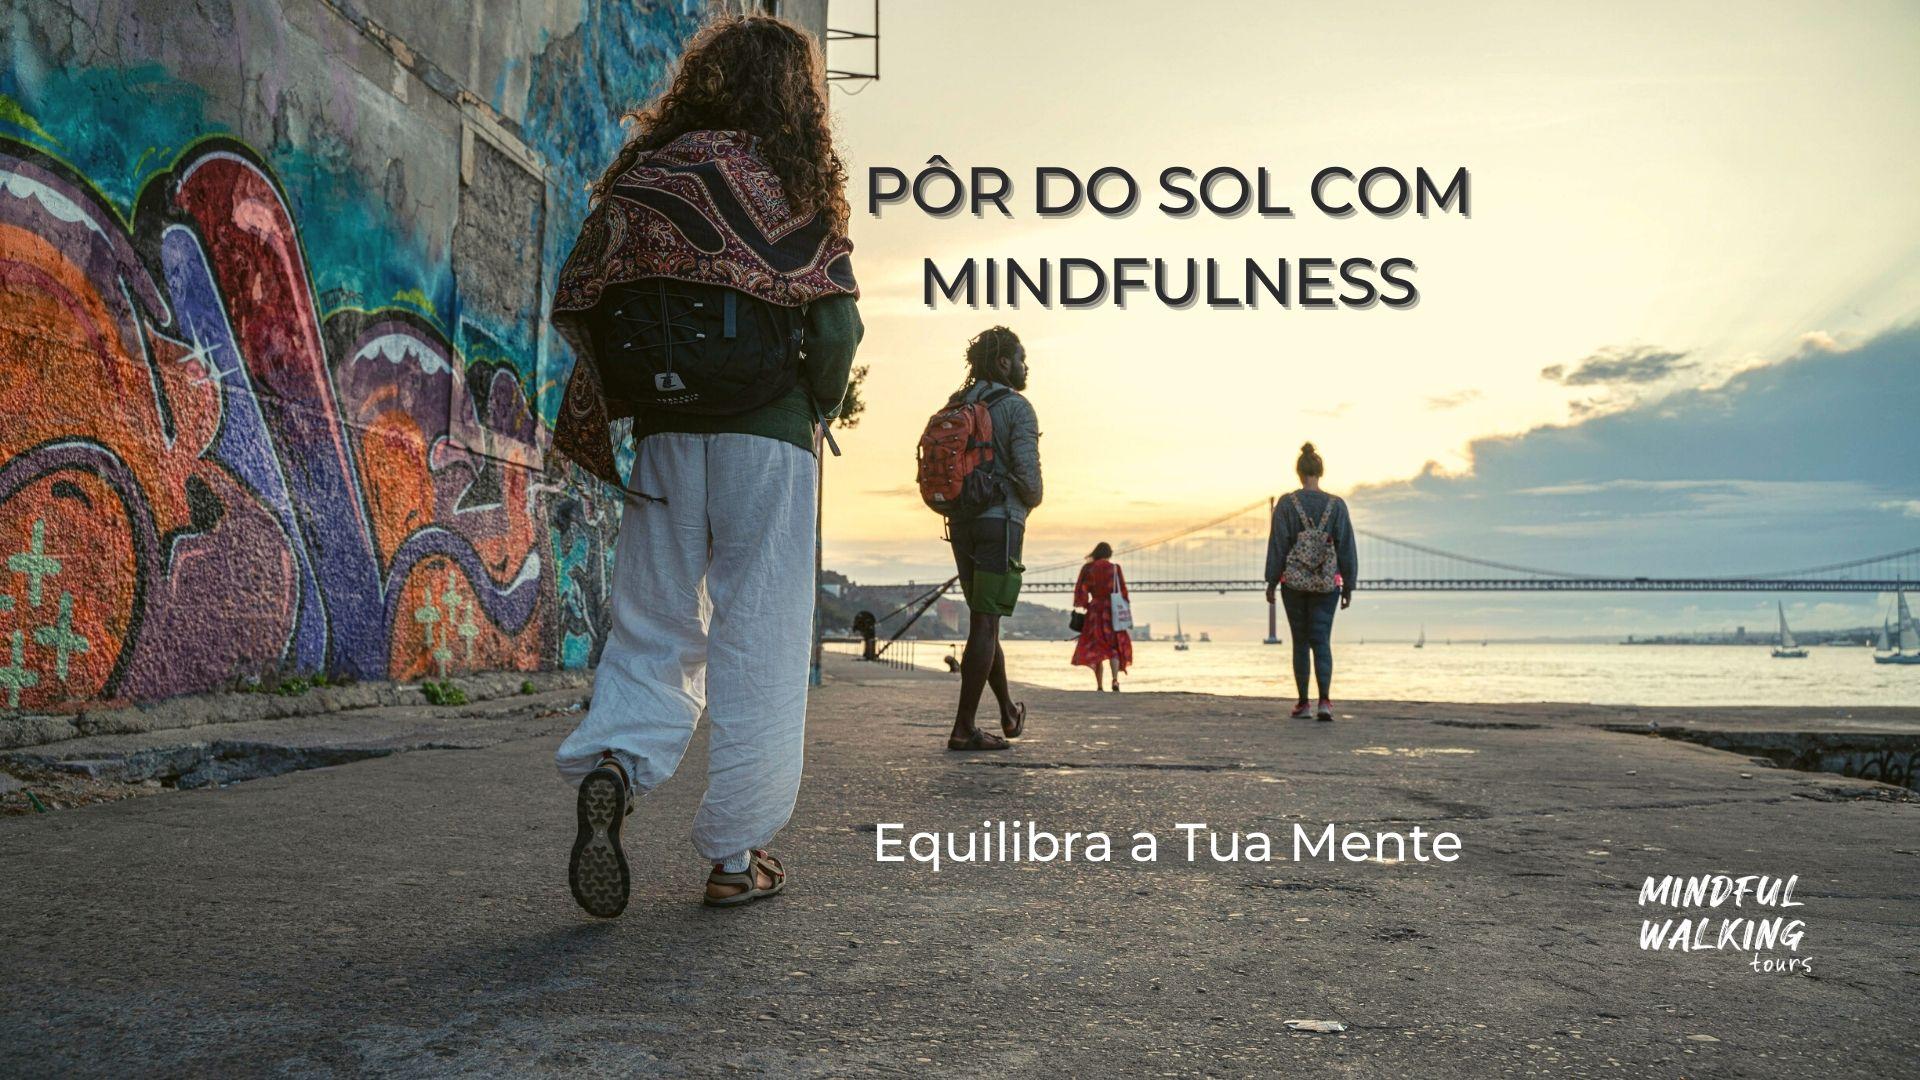 PÔR DO SOL COM MINDFULNESS